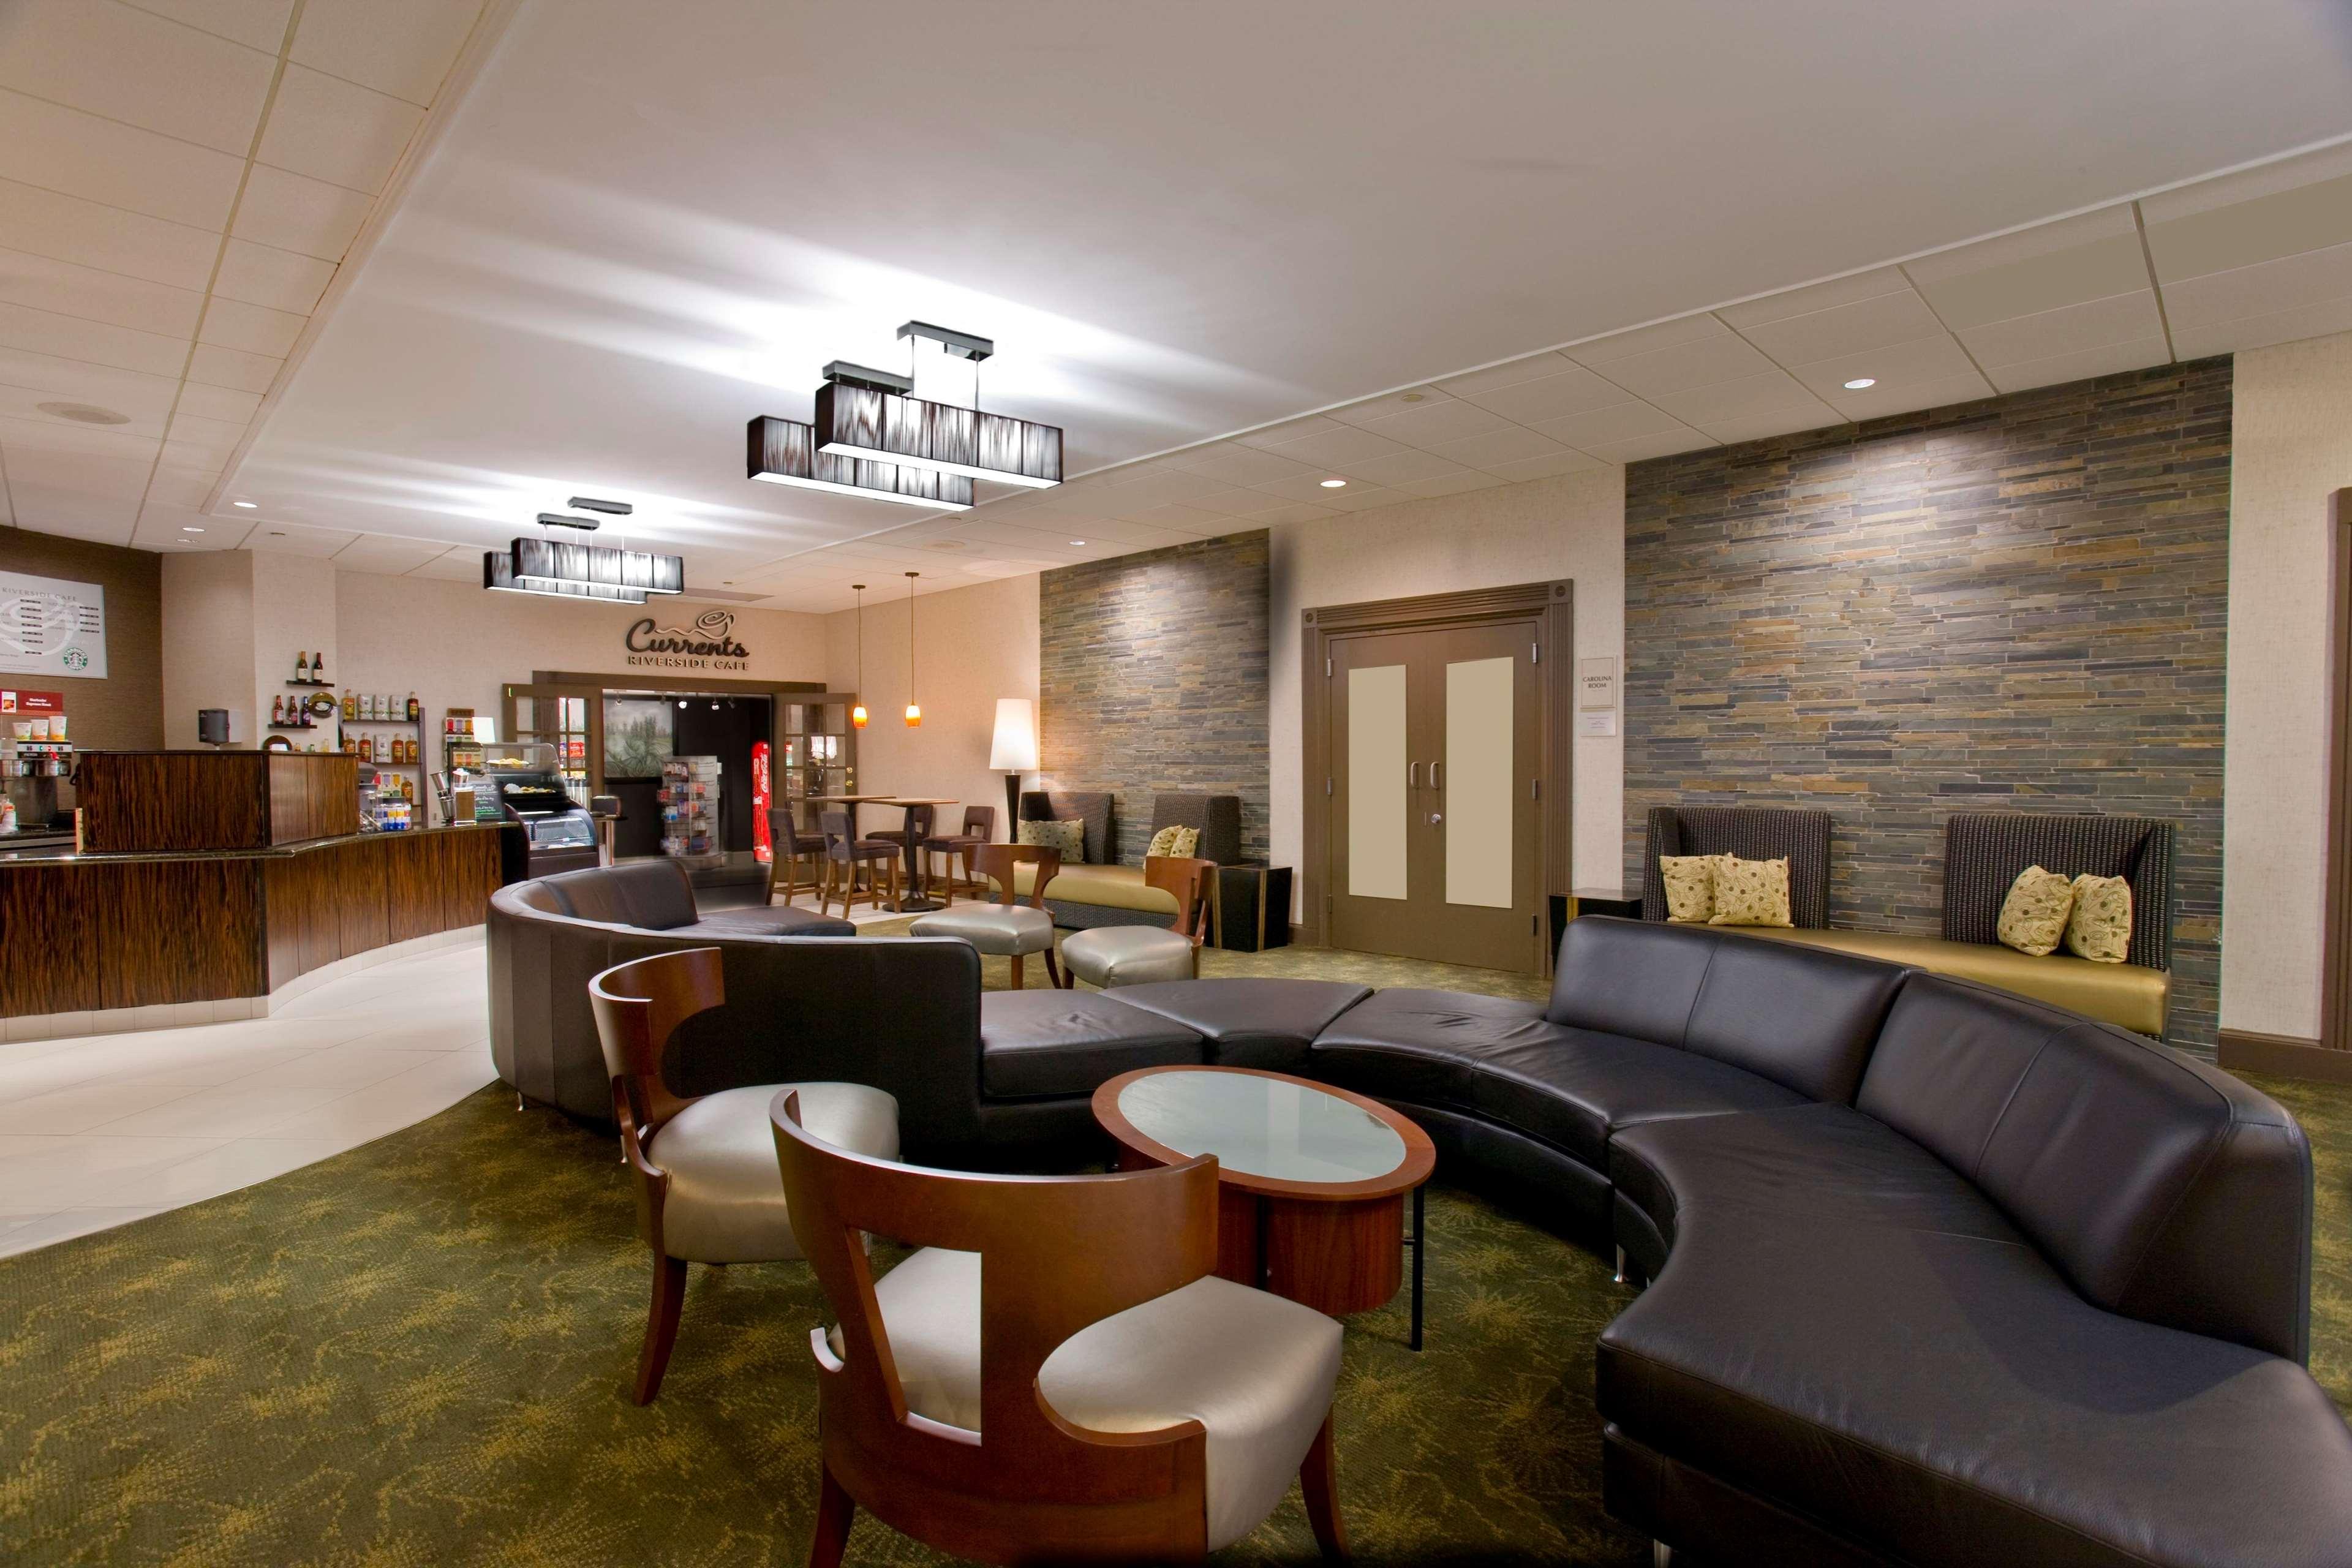 Hilton wilmington riverside wilmington north carolina nc for Hilton hotels near mercedes benz stadium atlanta